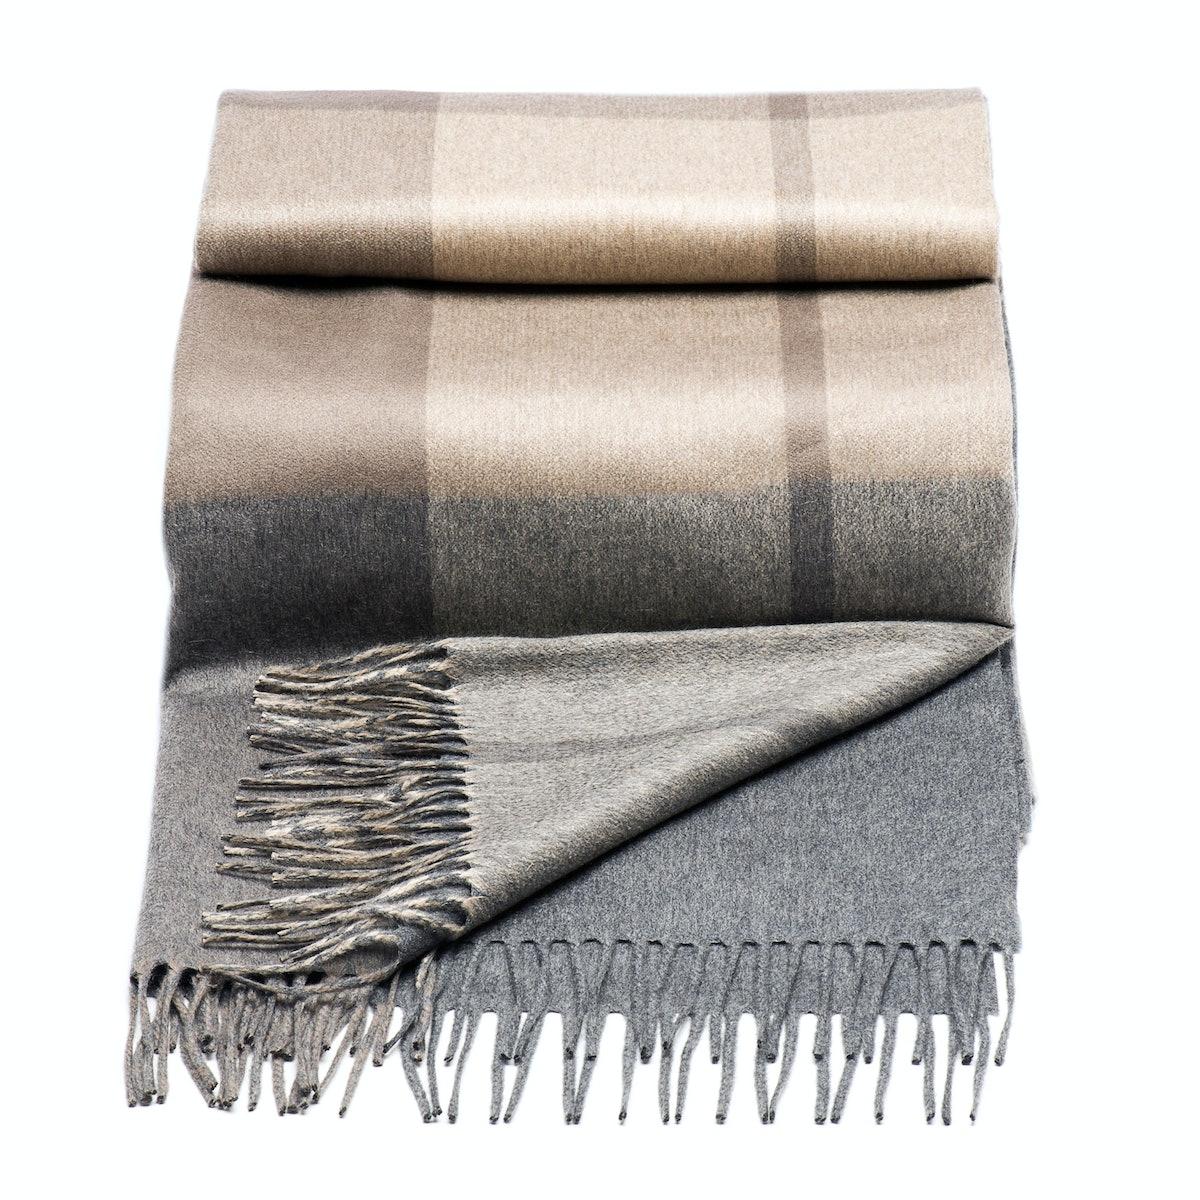 Brunello Cucinelli blanket, $2,890, [neimanmarcus.com](http://rstyle.me/~18Luc).